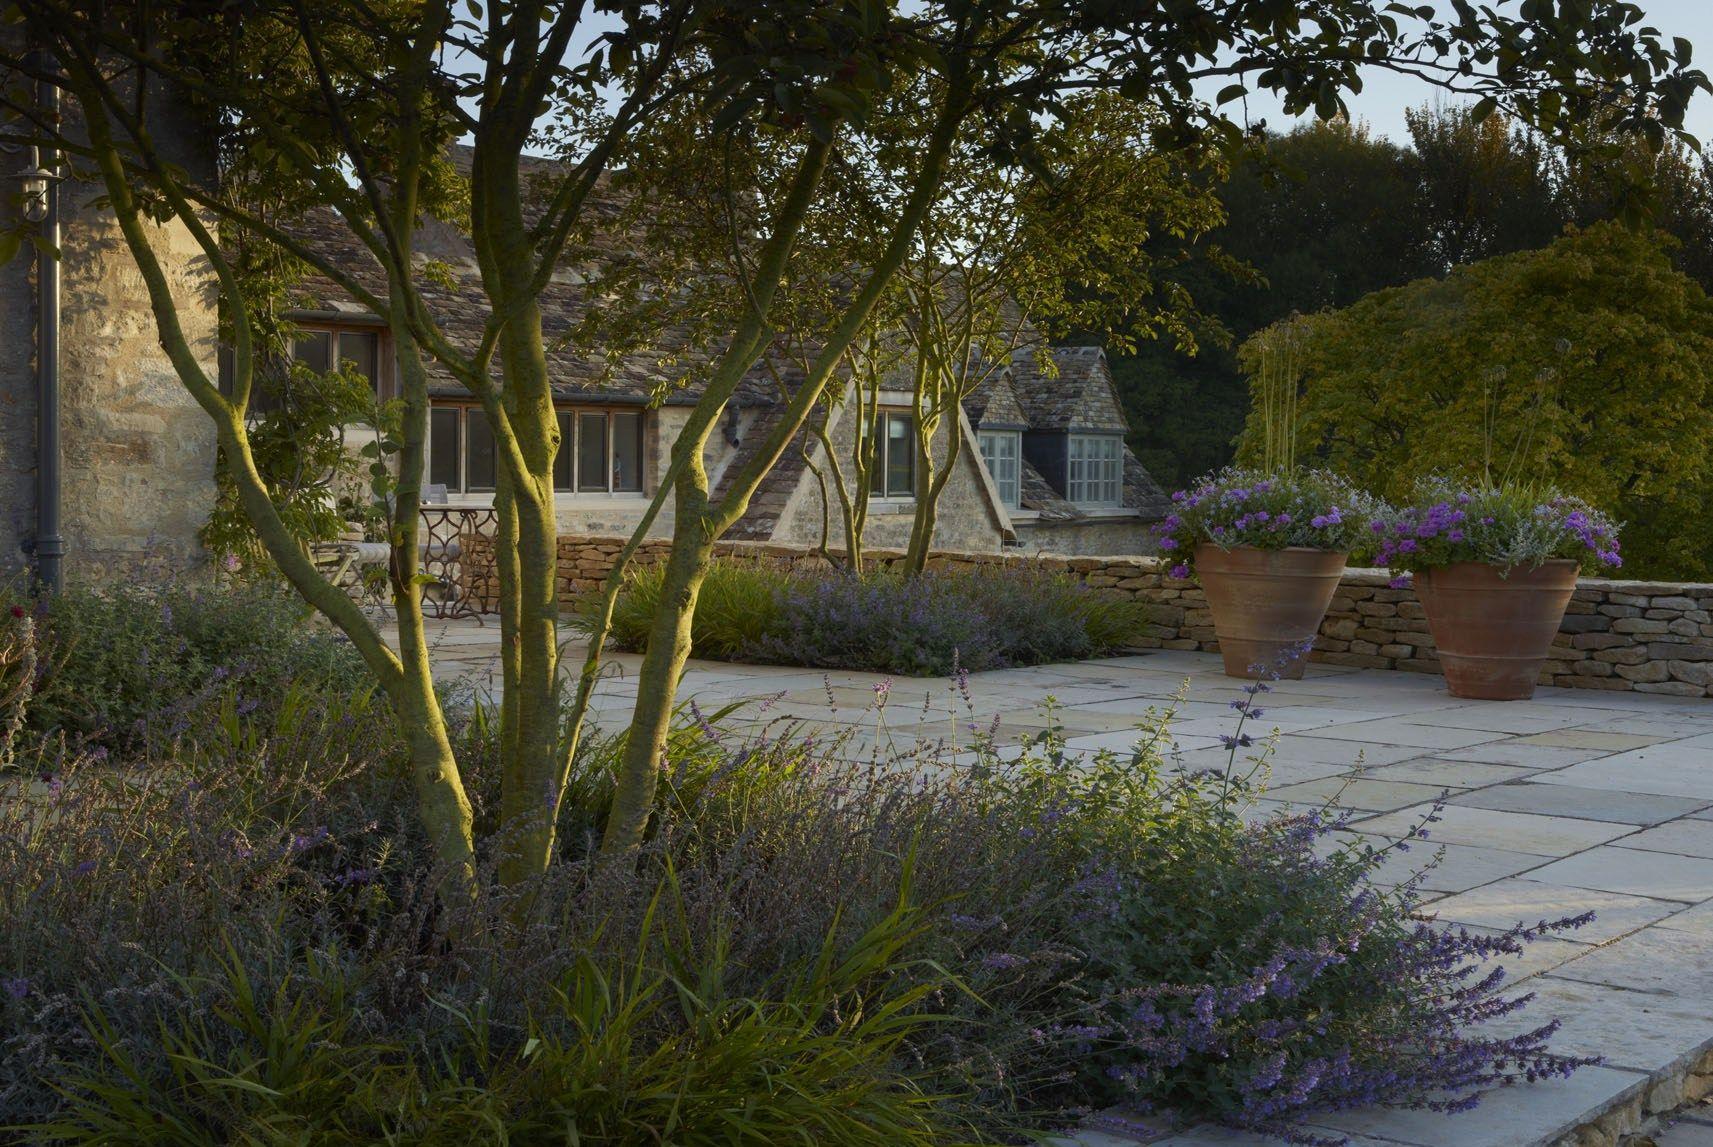 3 4 1 Cirencester 5 Tree Garden Design Country Gardening Dry Garden